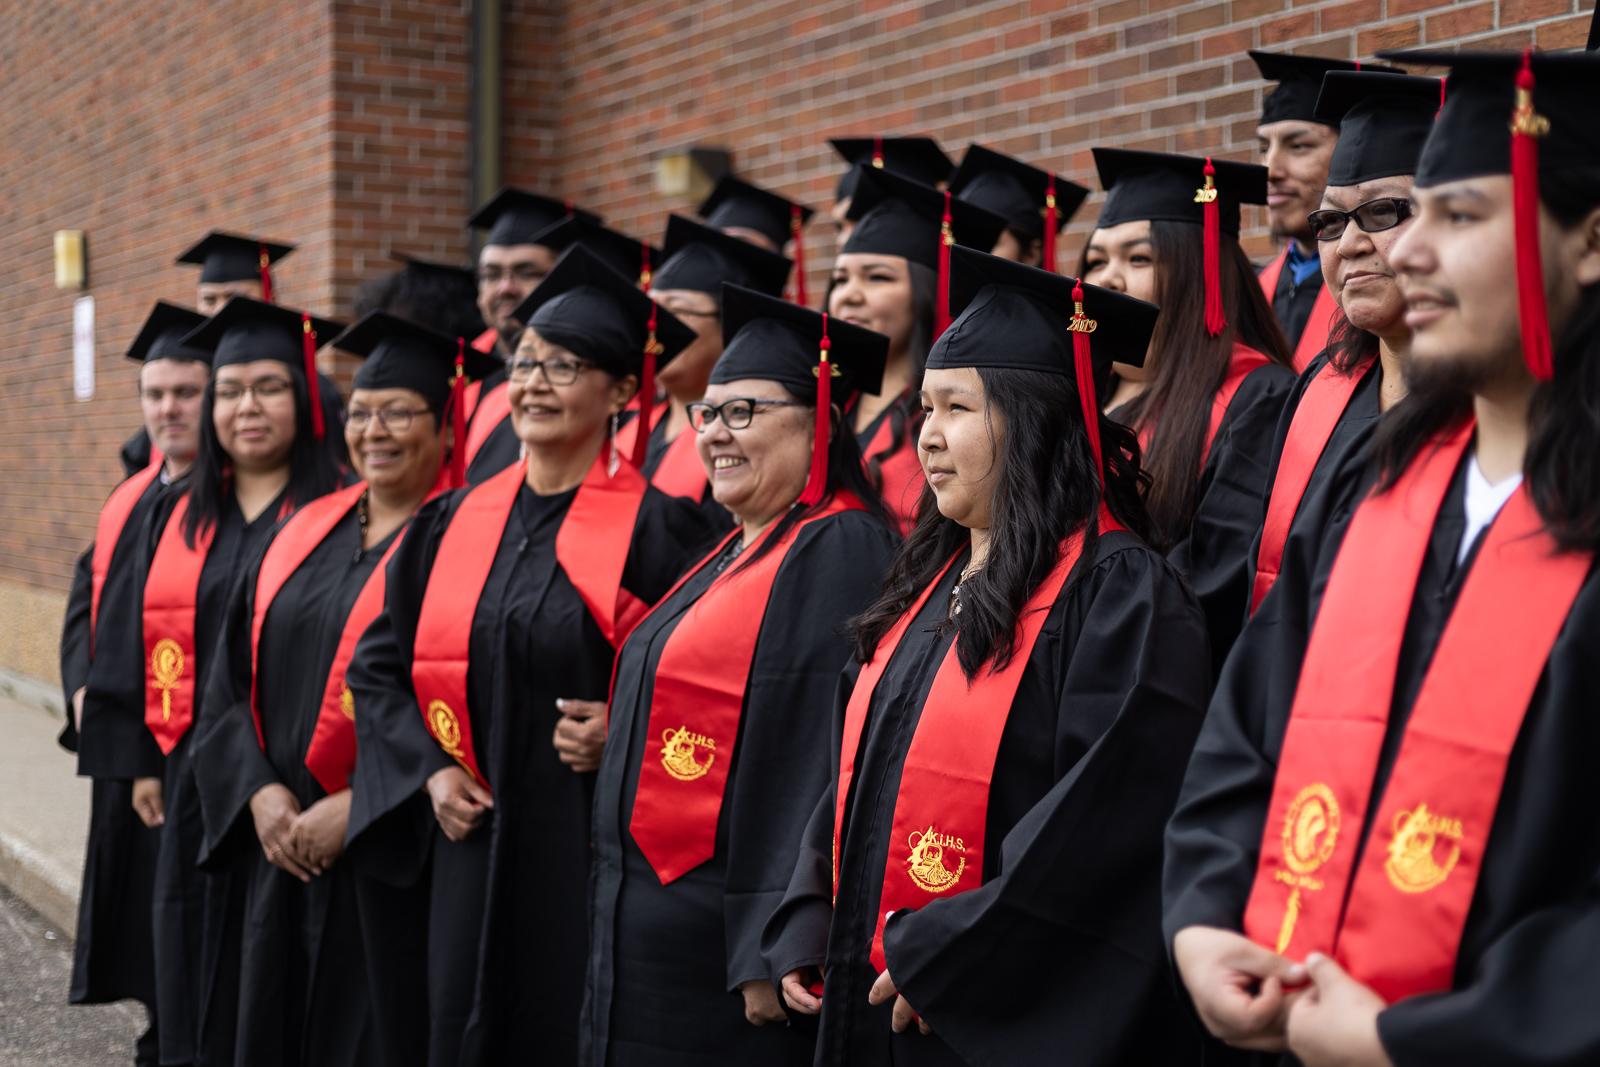 kihs-graduation-2019-fb-7.jpg